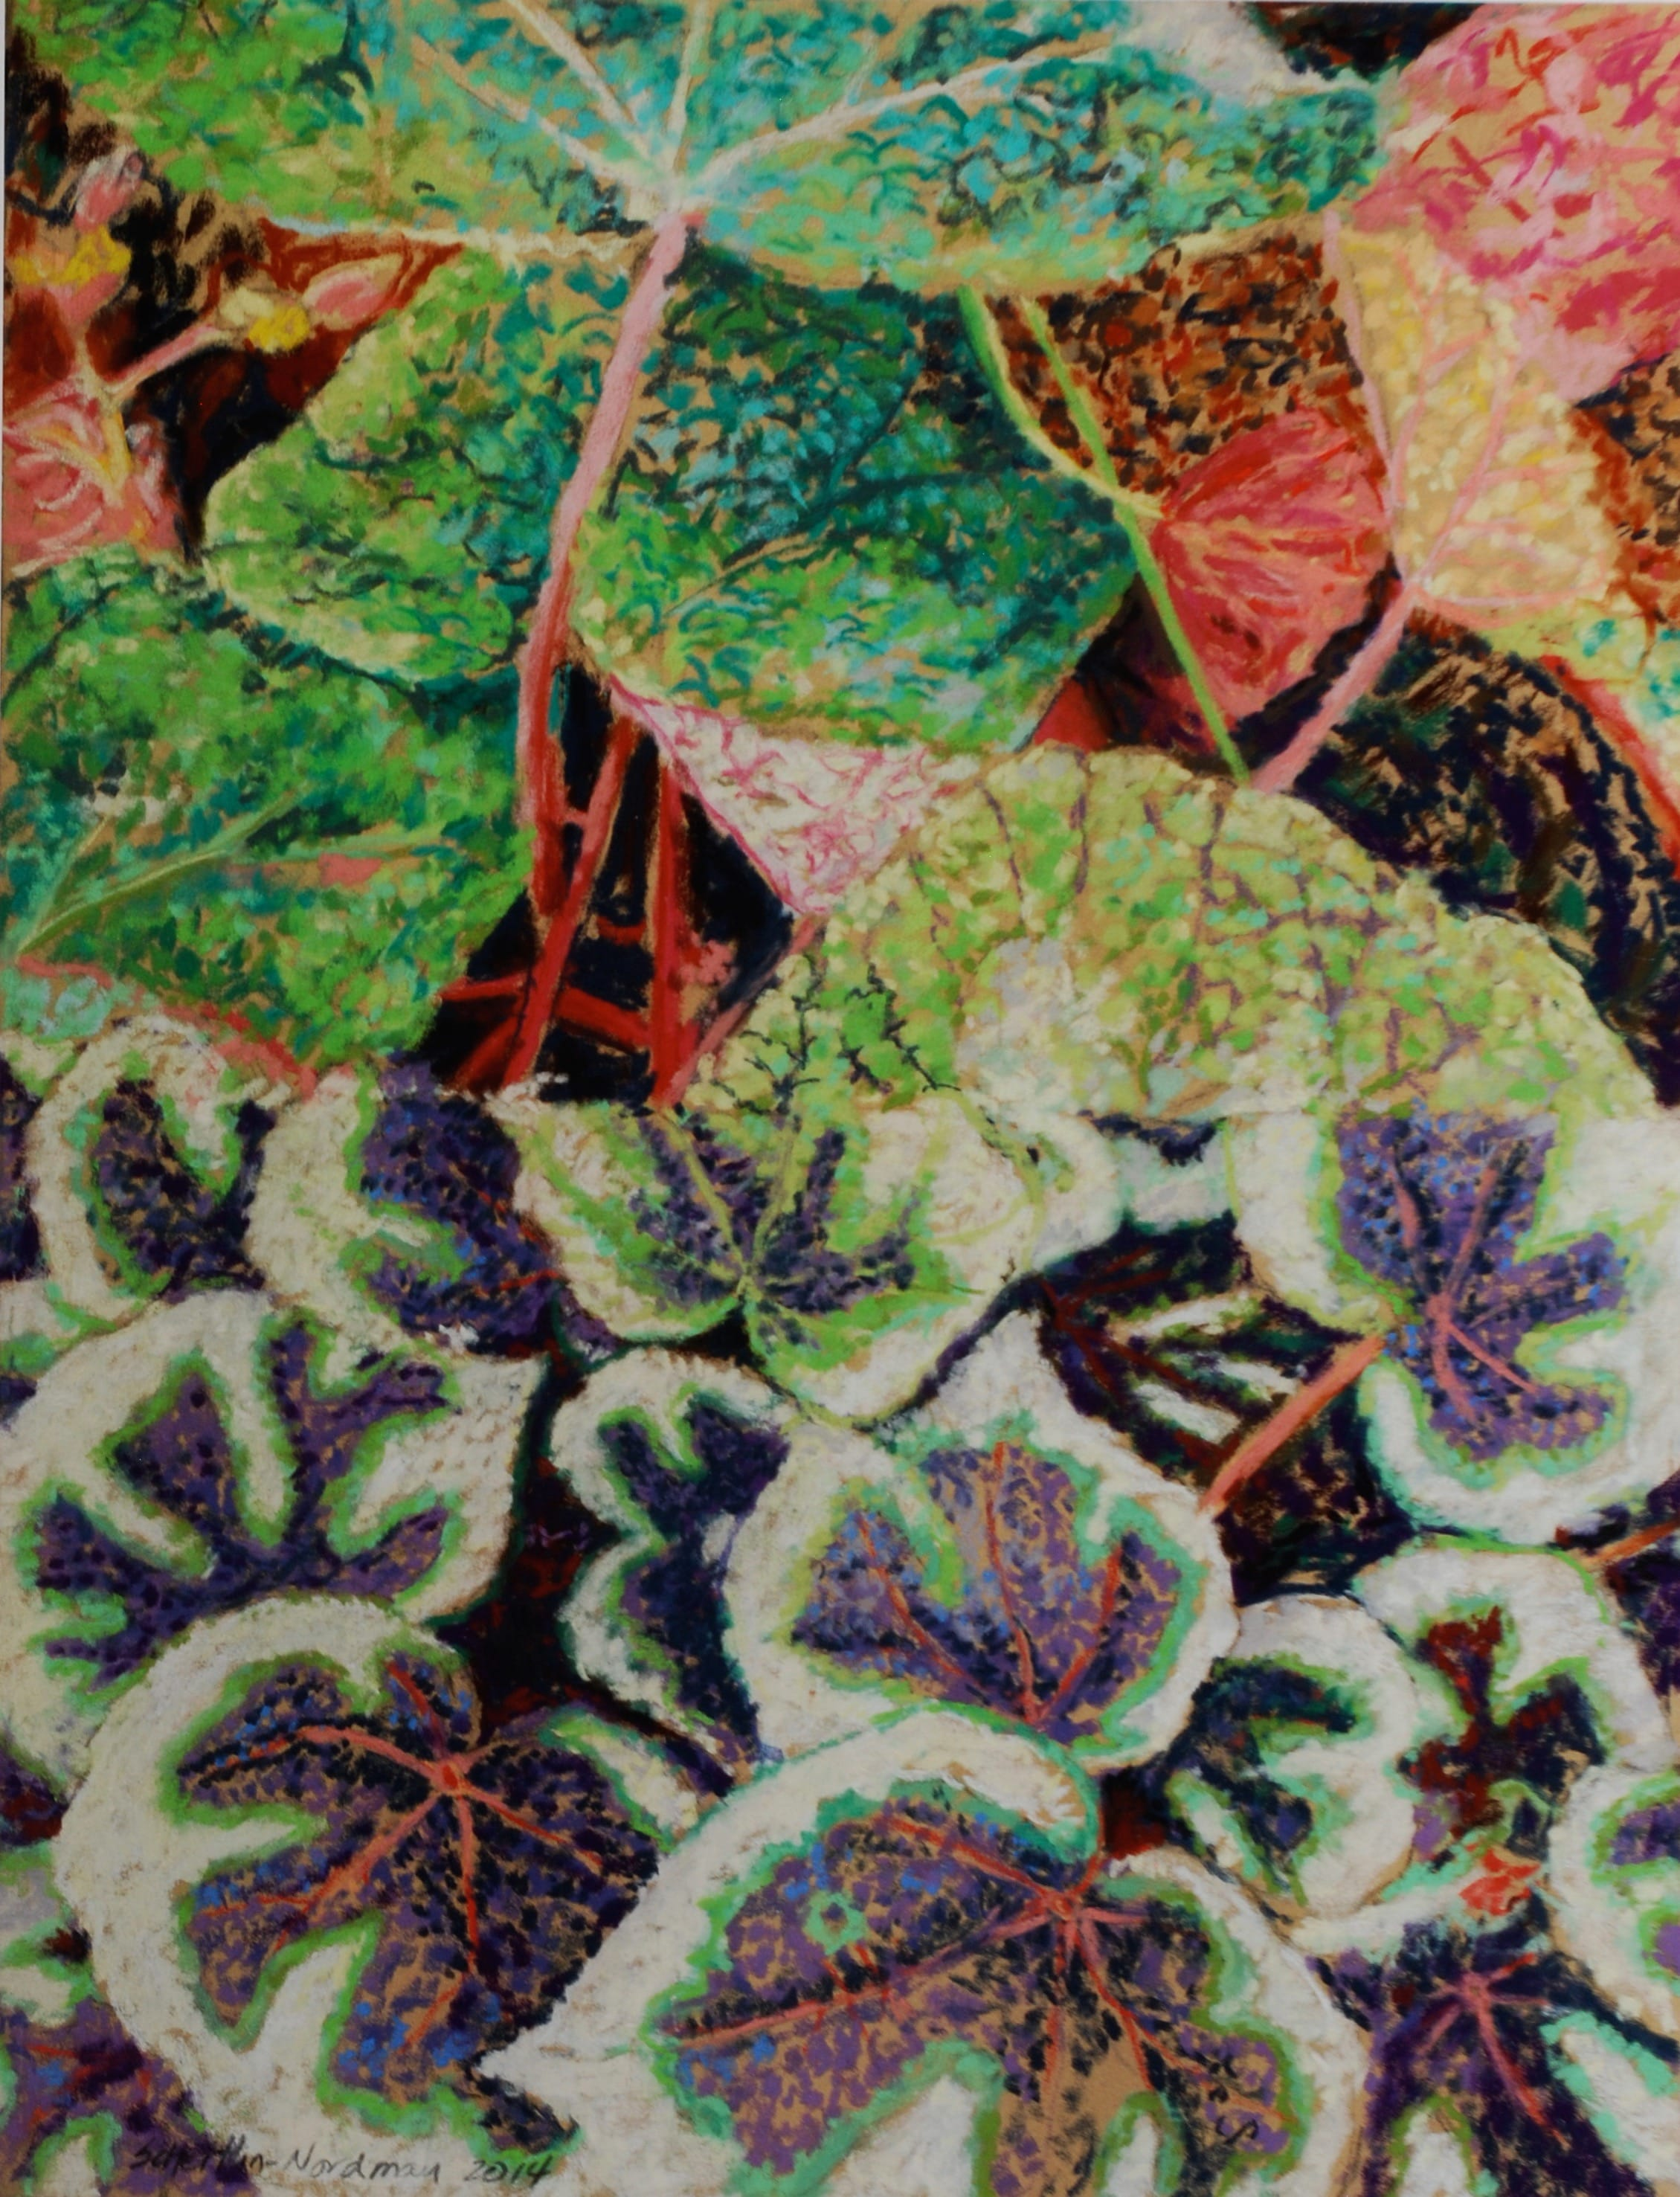 Green Thumb, 2014, 65x50 cm